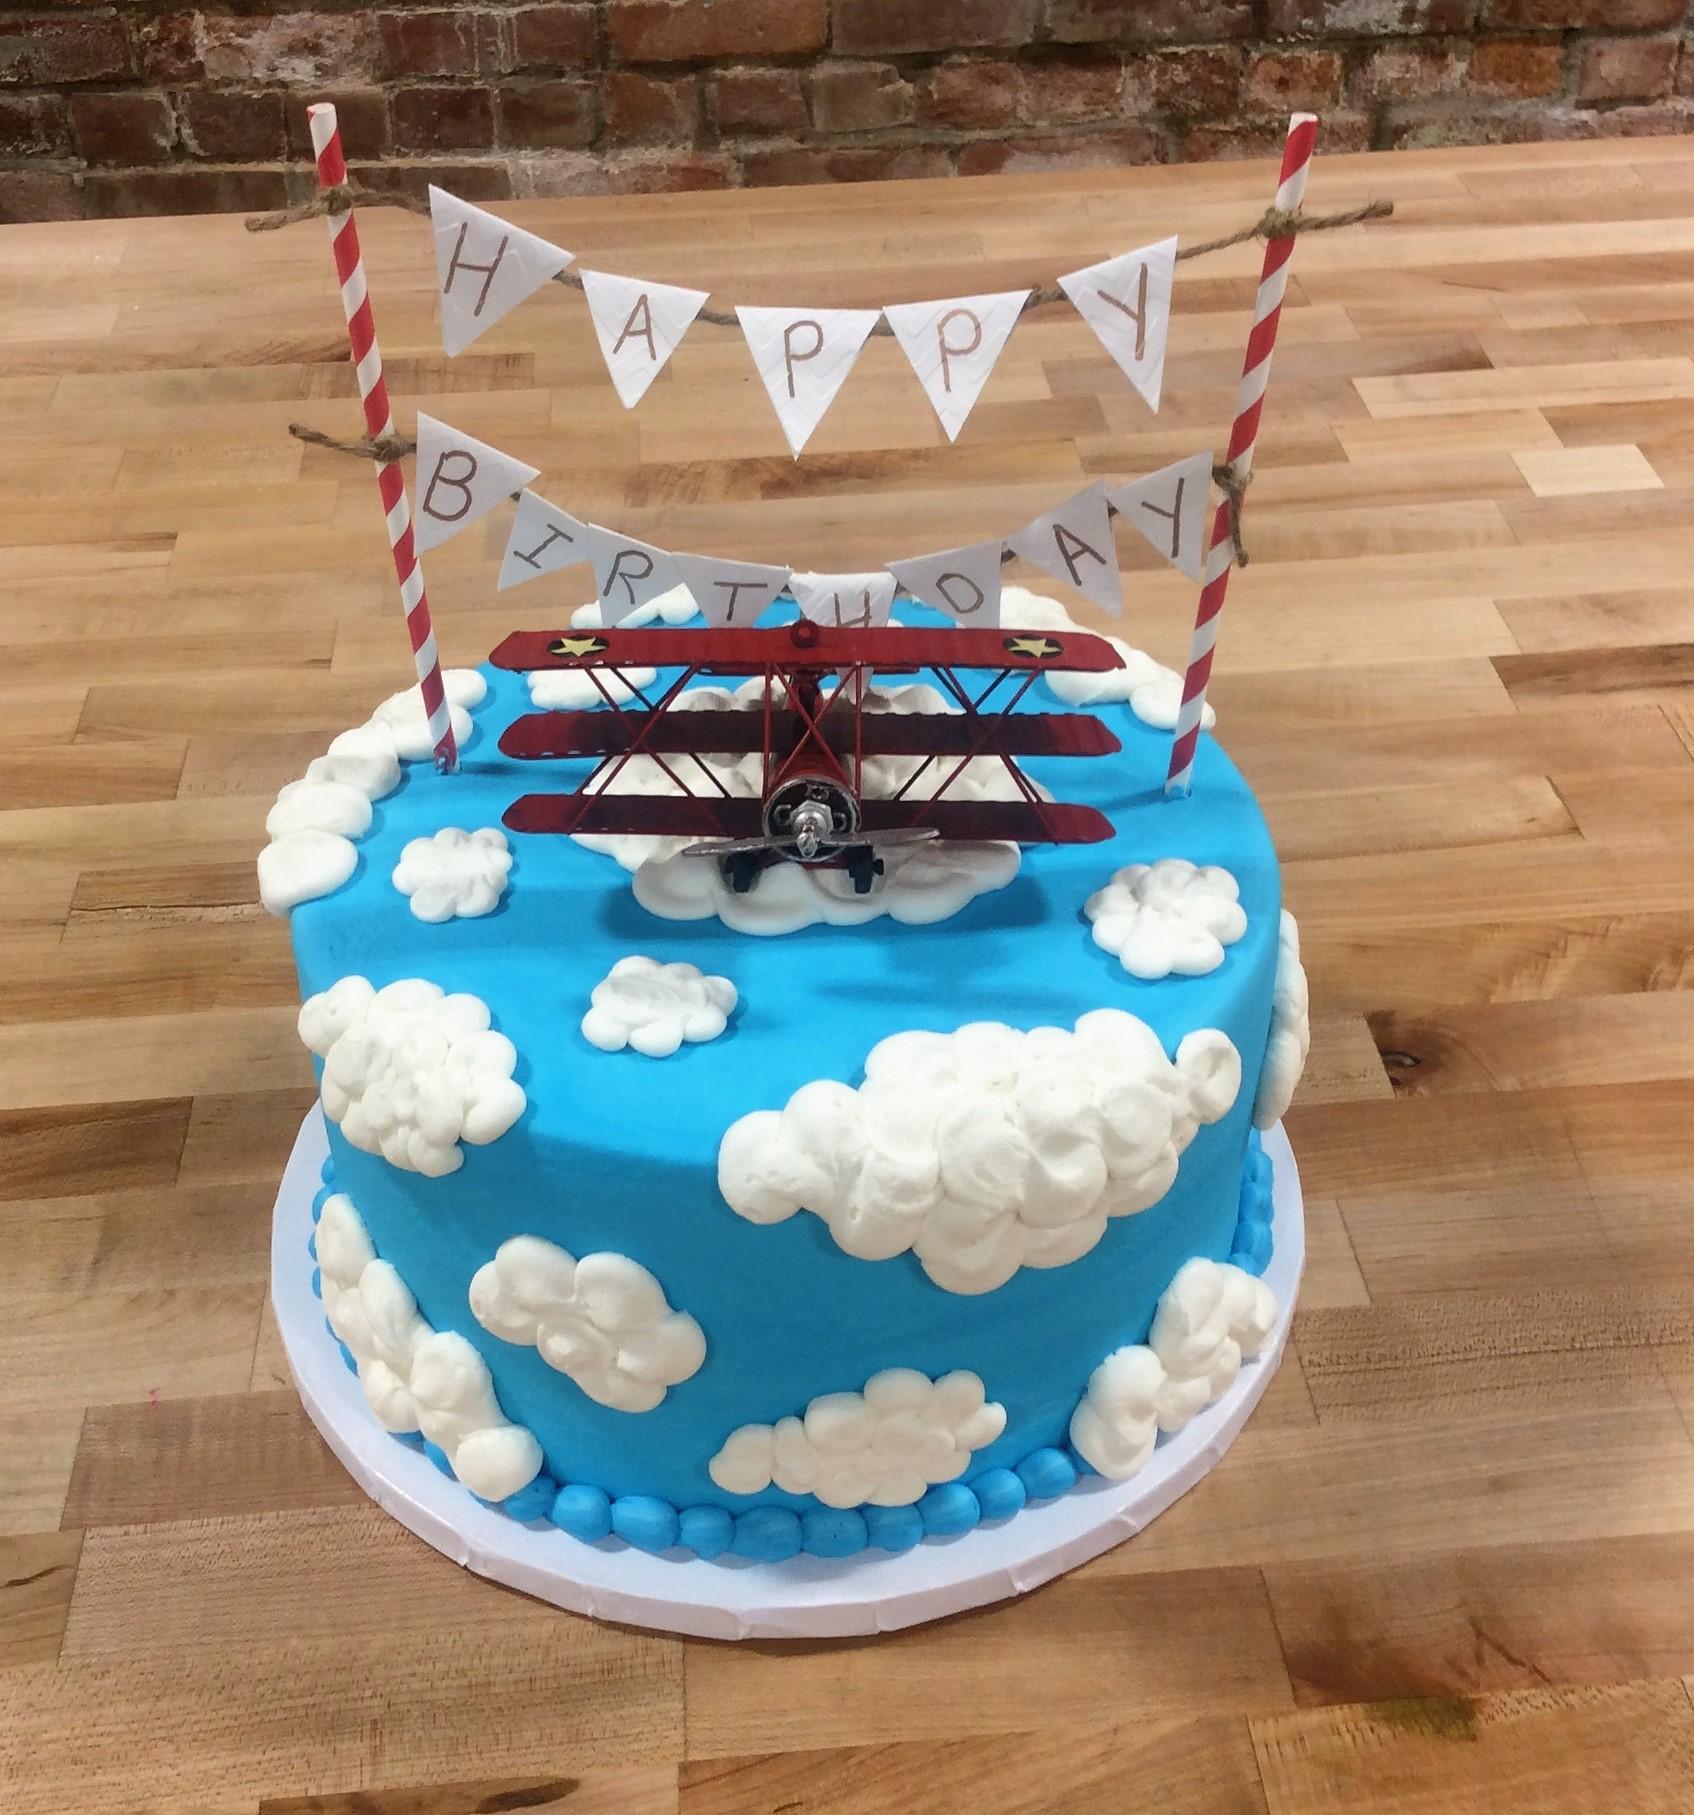 Cloudy Birthday Cake